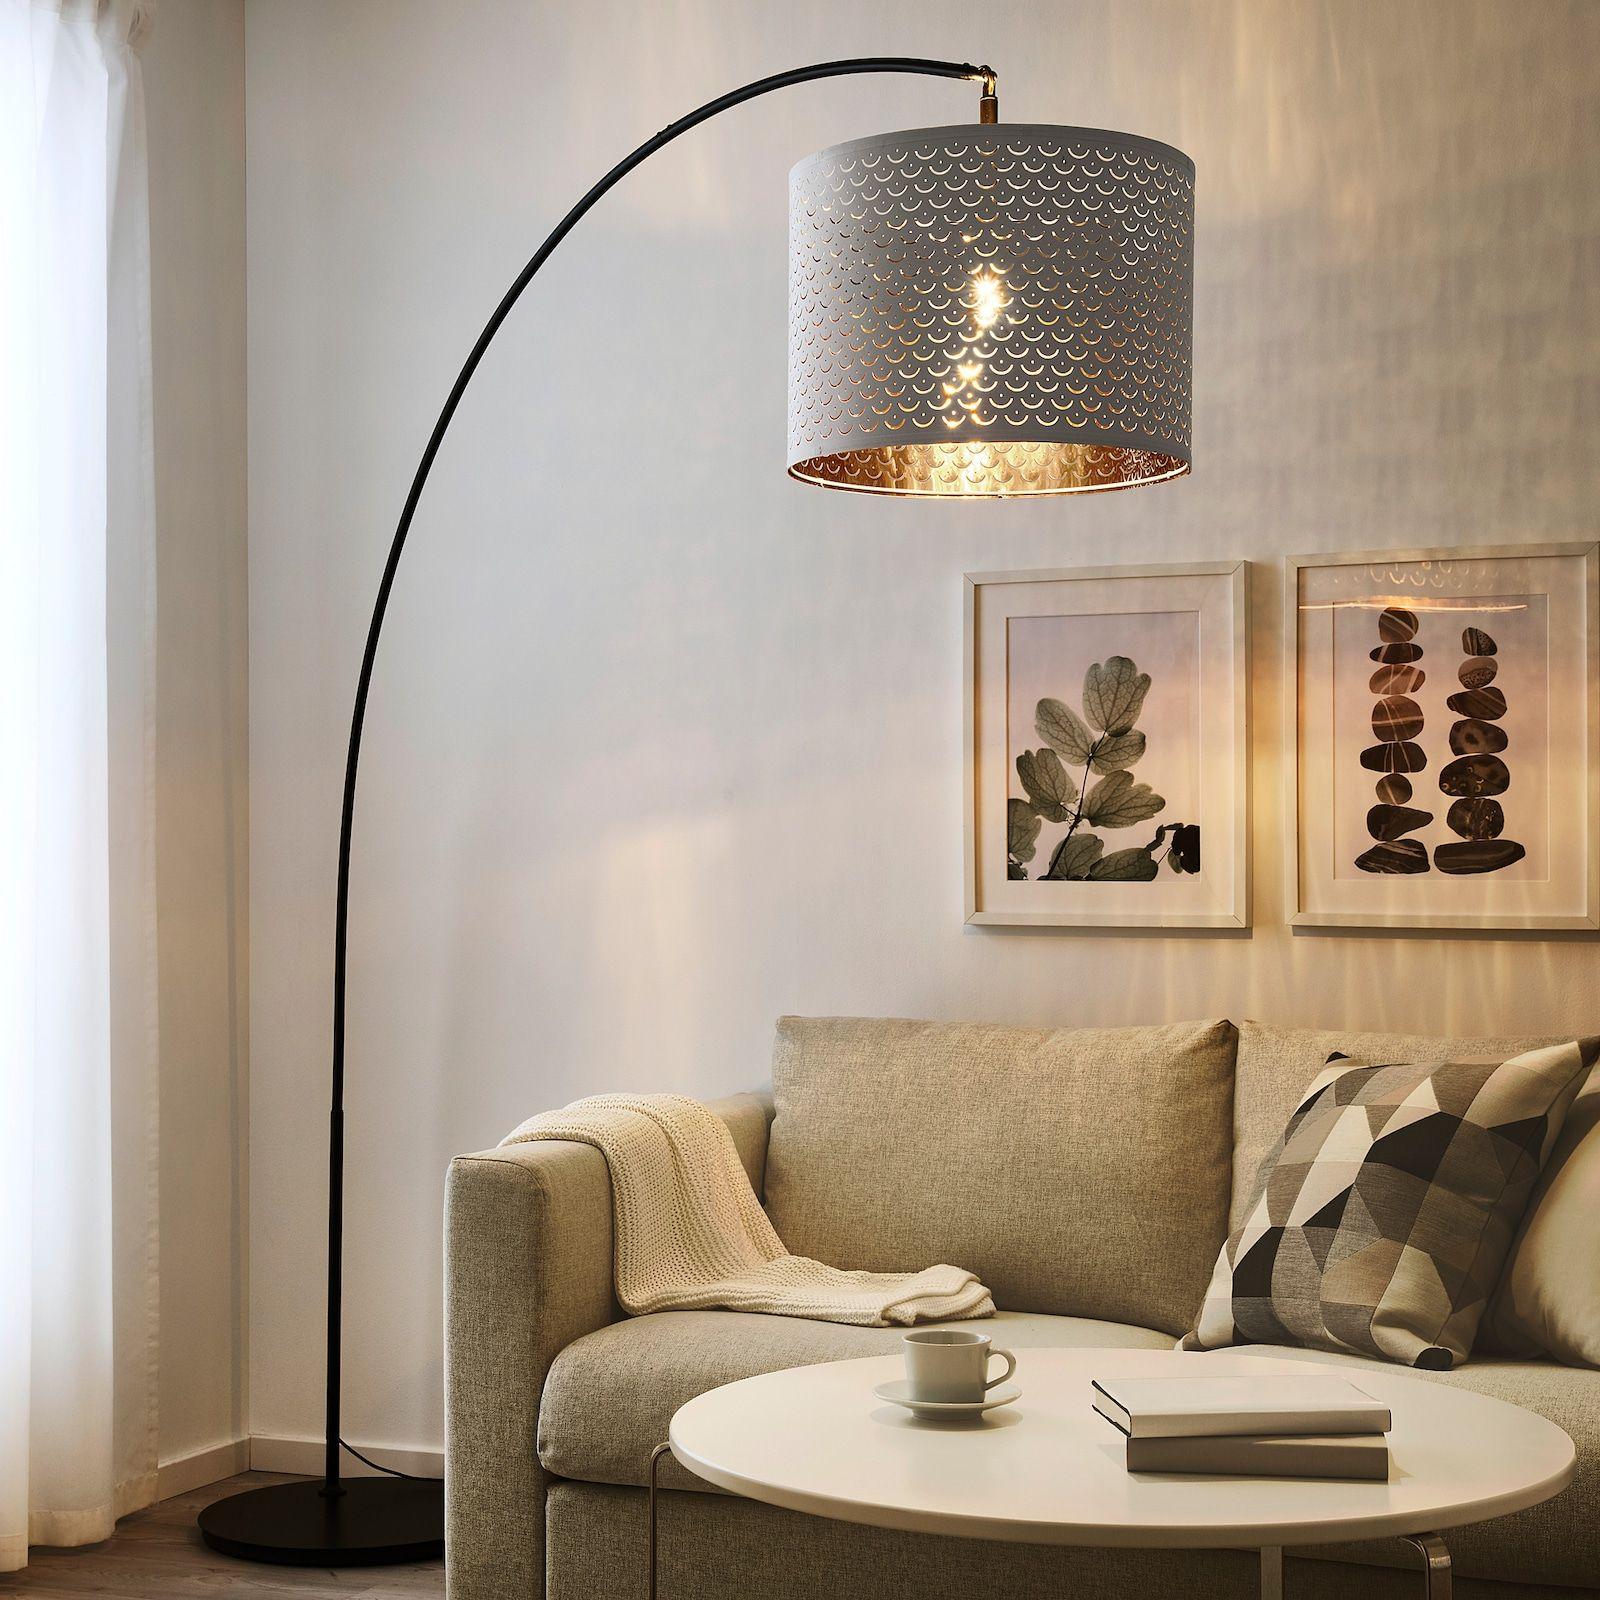 Nymo Skaftet Floor Lamp Arched White Brass Color Ikea In 2021 Floor Lamp Base Floor Lamp Mid Century Floor Lamps